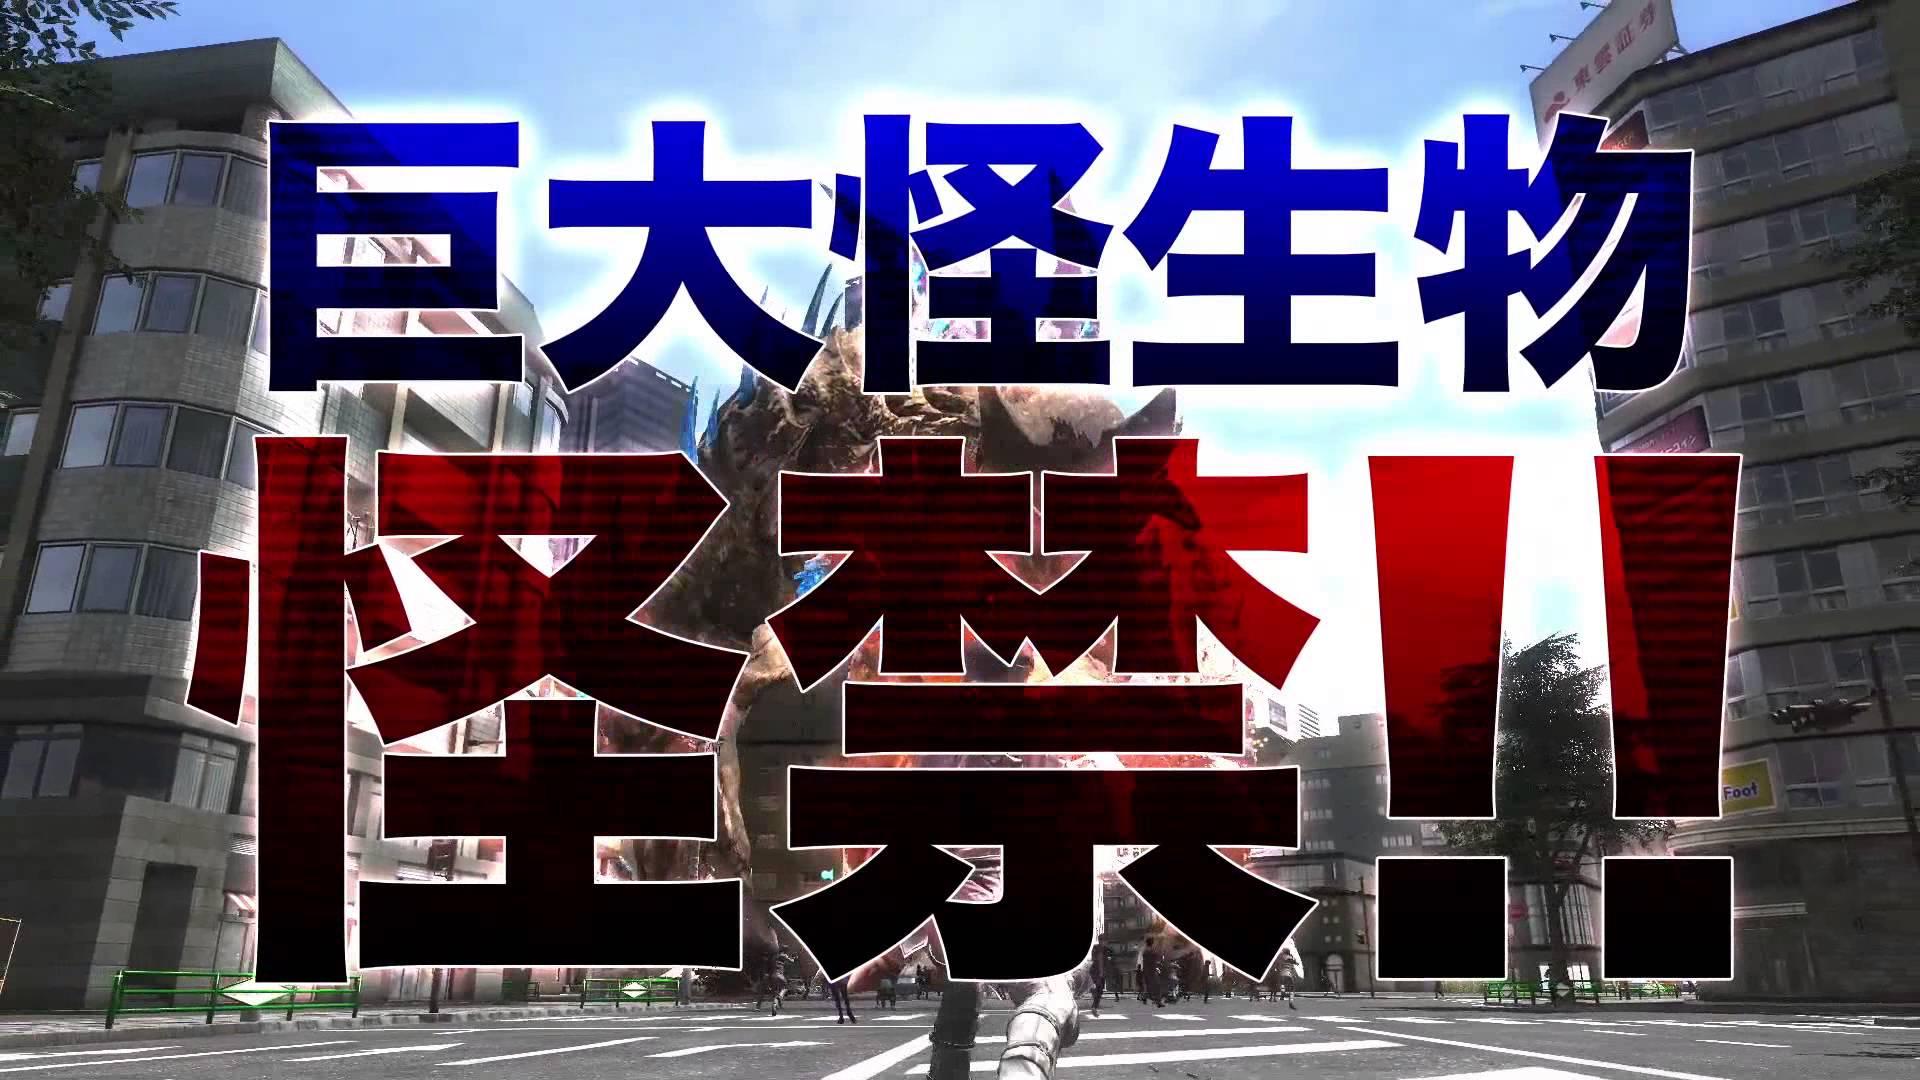 PS4『地球防衛軍4.1』発売日の延期が決定。新たな発売日は4月2日